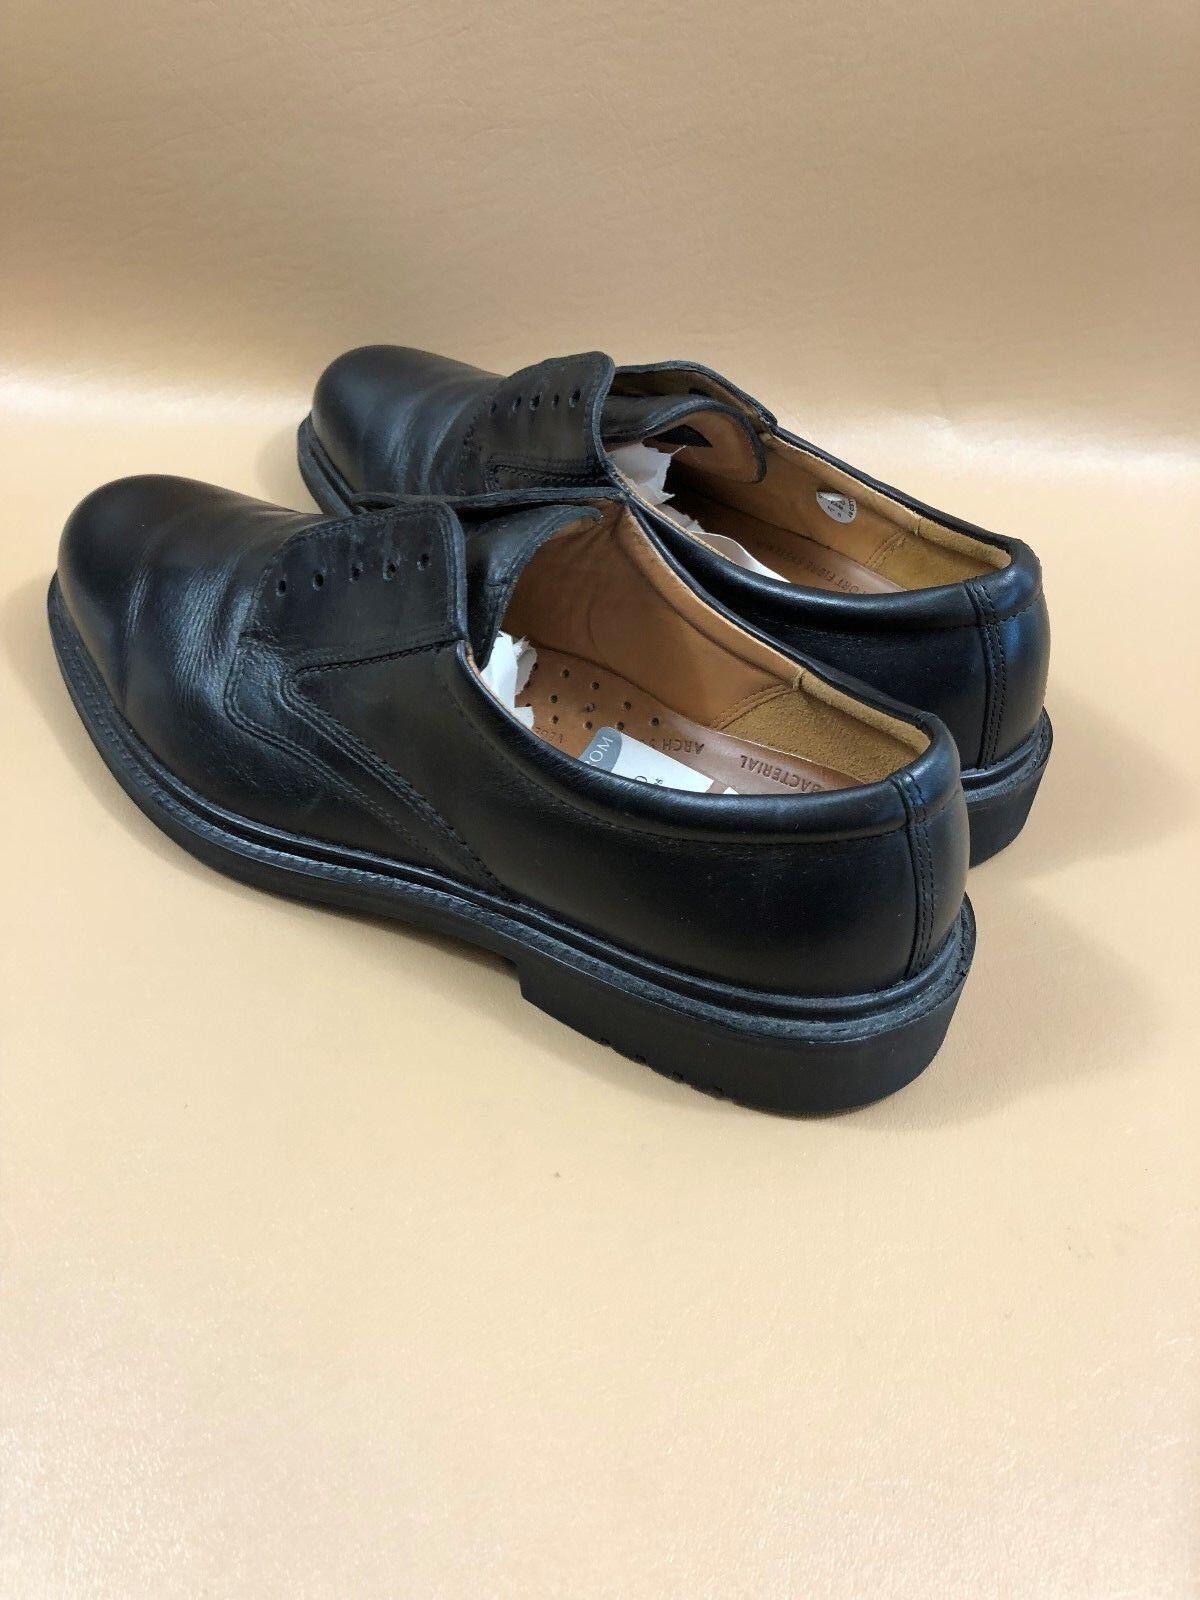 5aa3a68fe810 ... Gentleman Lady Gentleman Lady Gentleman Lady ECCO Black Leather Oxfords  Size 43 Consumer ...